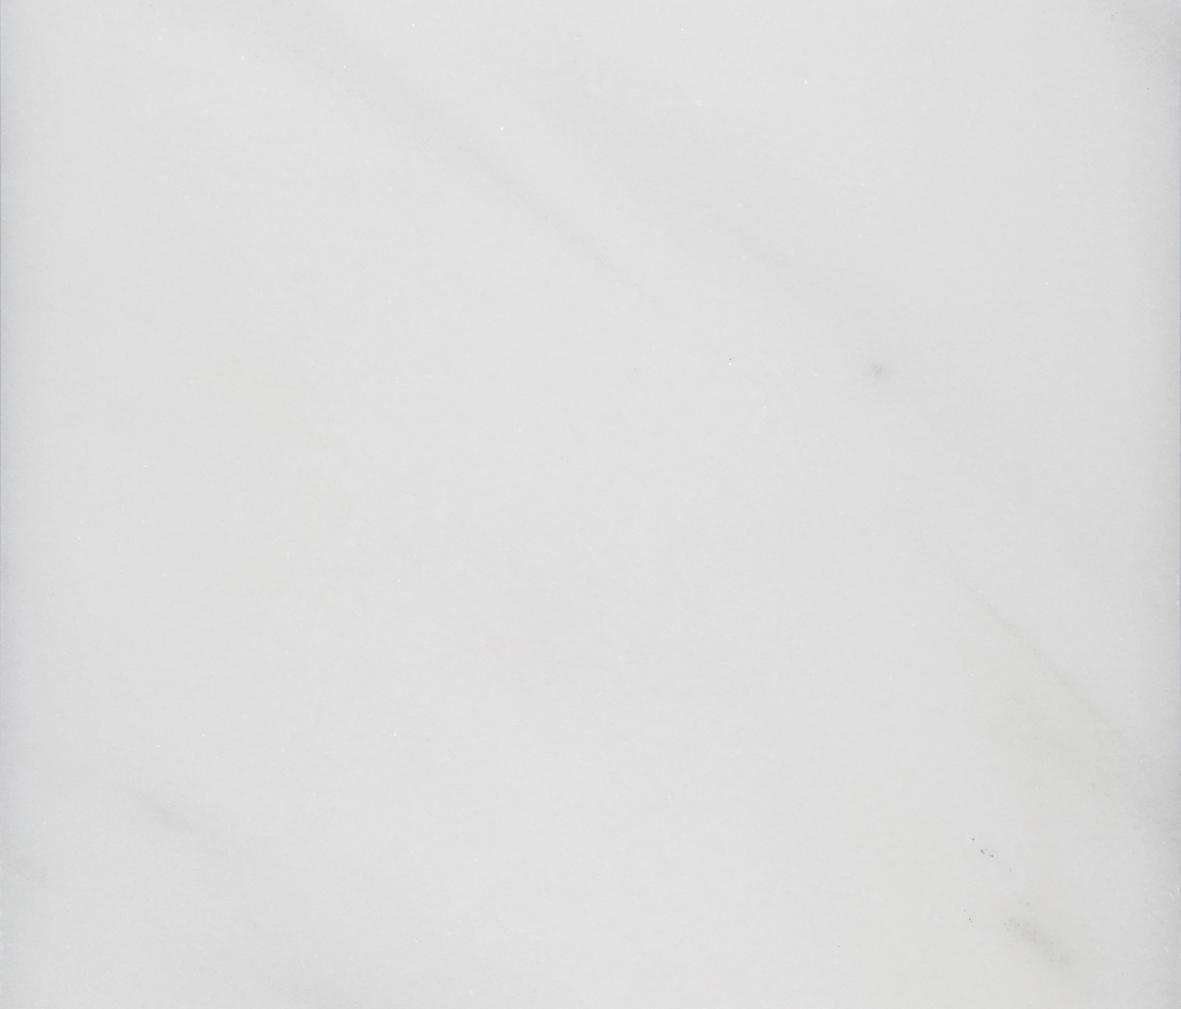 Scalea marmol blanco macael natural stone panels from for Marmol blanco macael